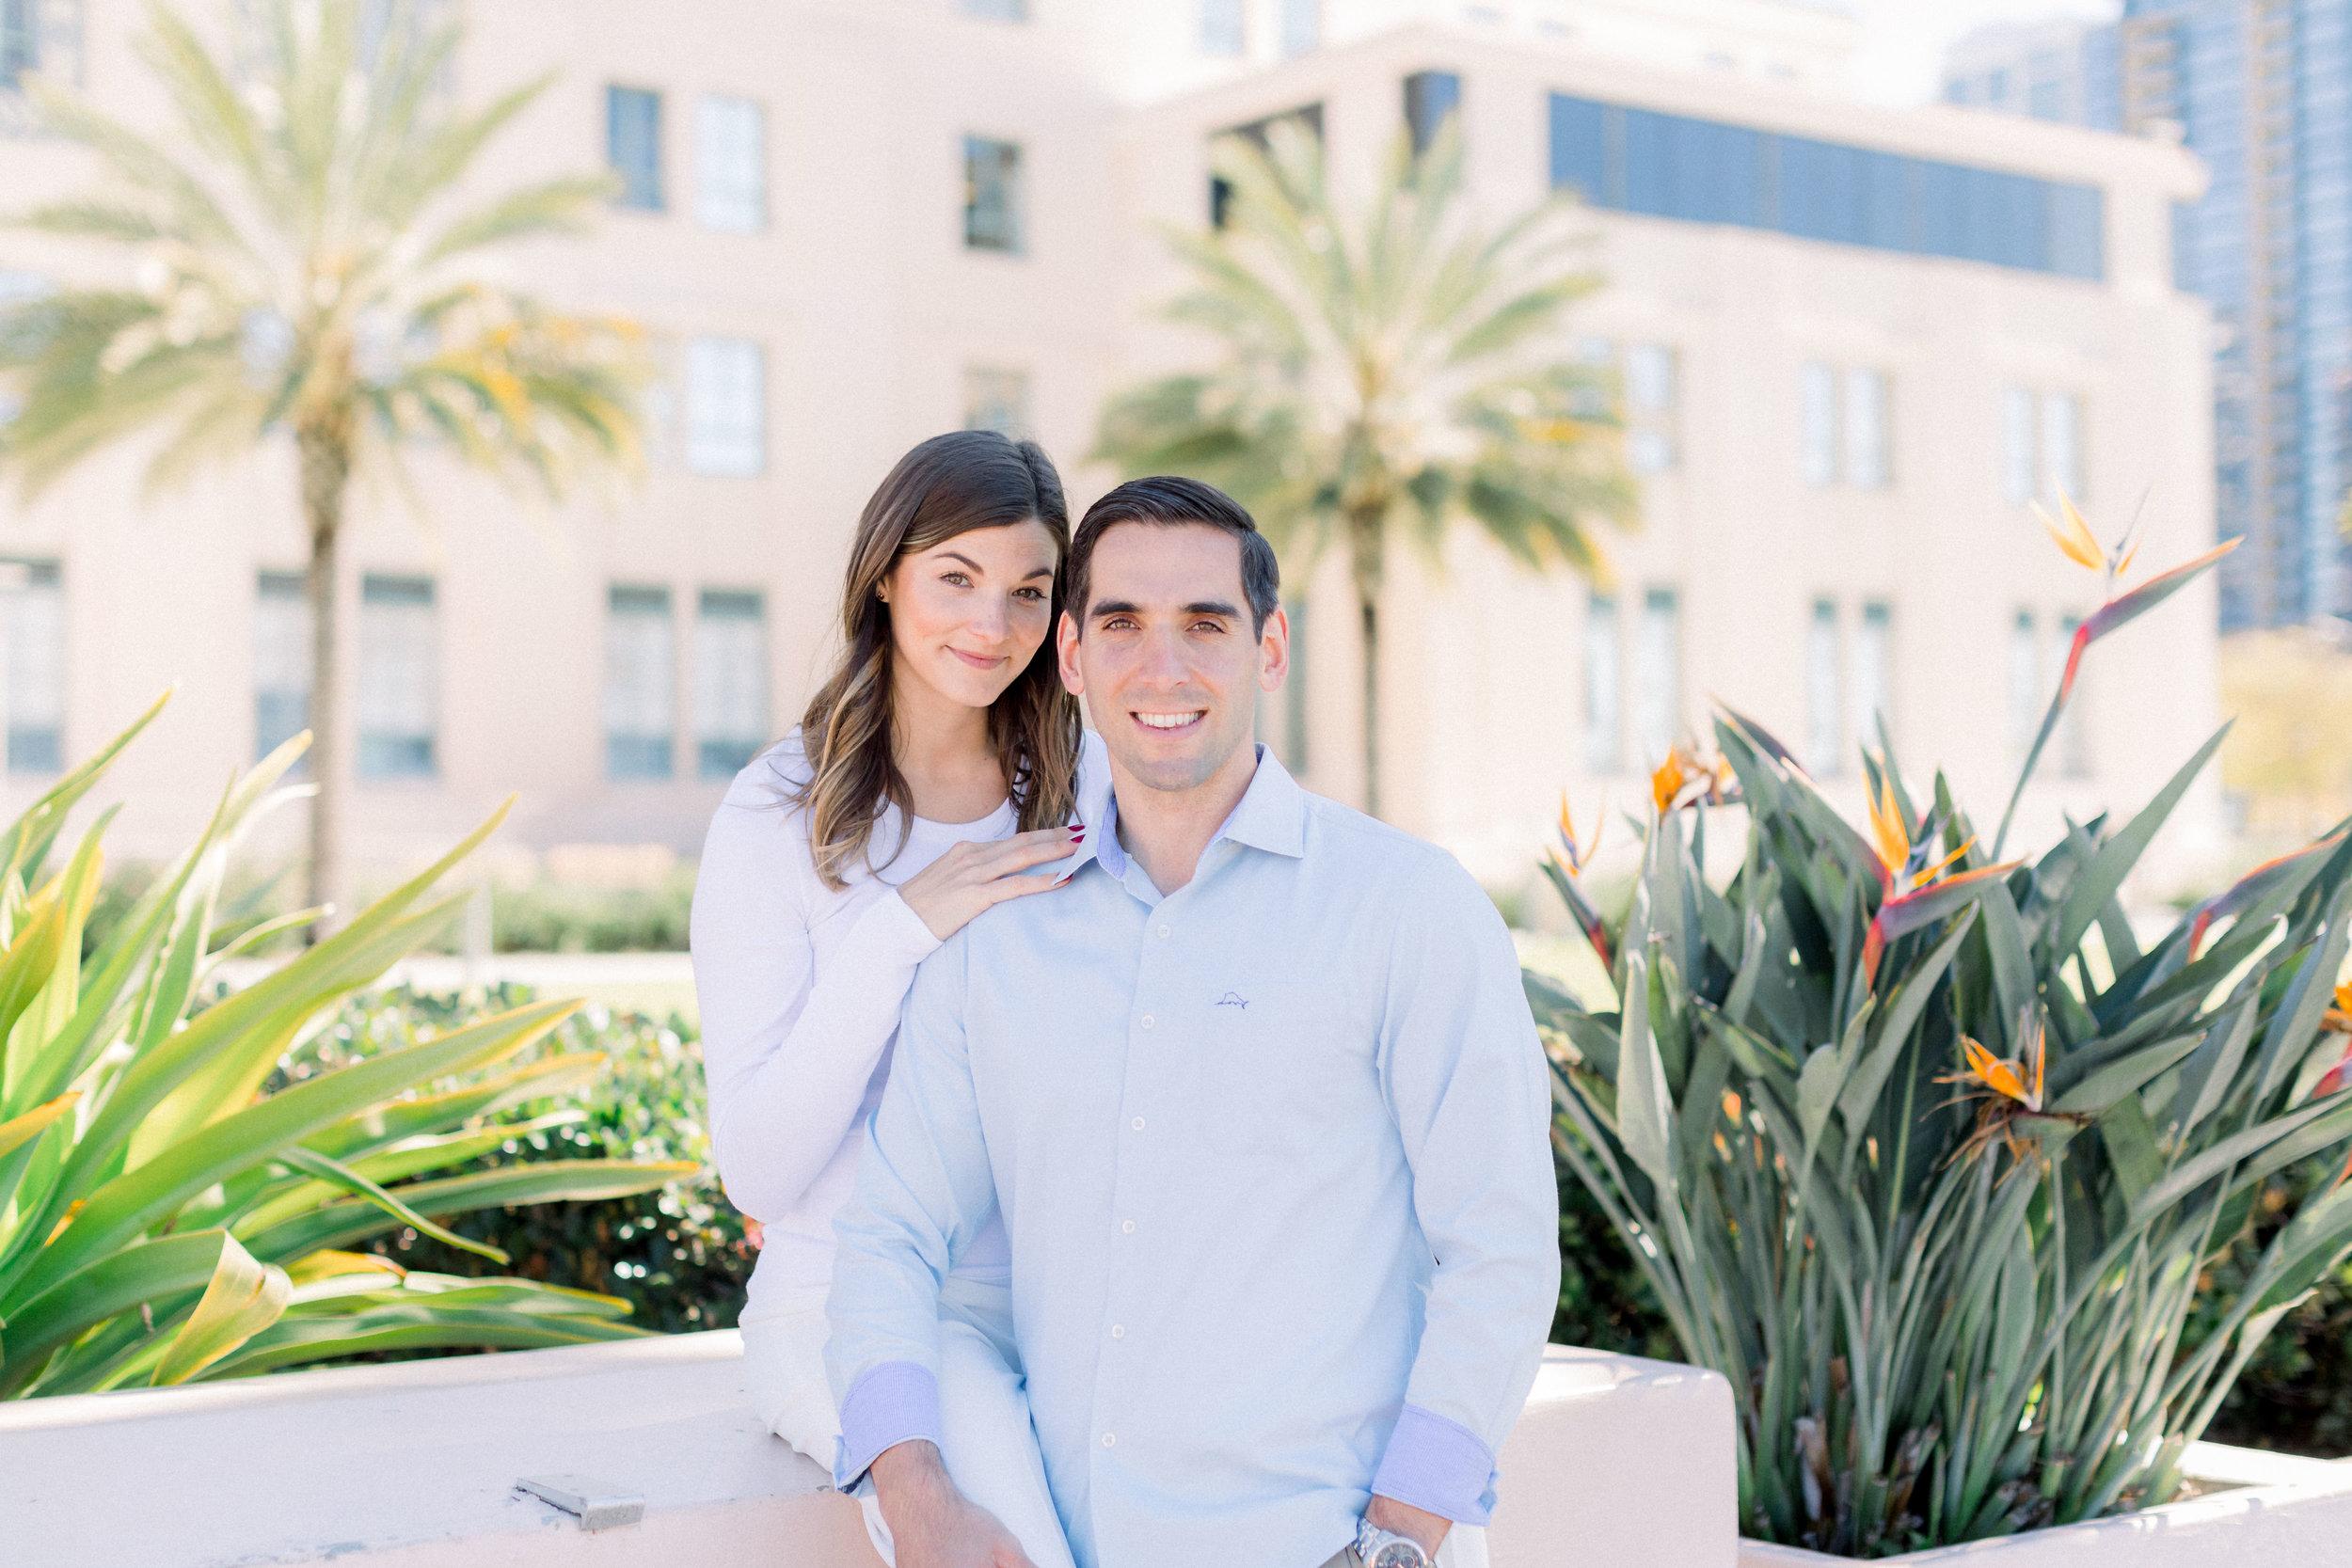 Claire_and_Dan_San_Diego_Administration_Building_Elopement_Alyssa_Boynton_Photography-42.jpg